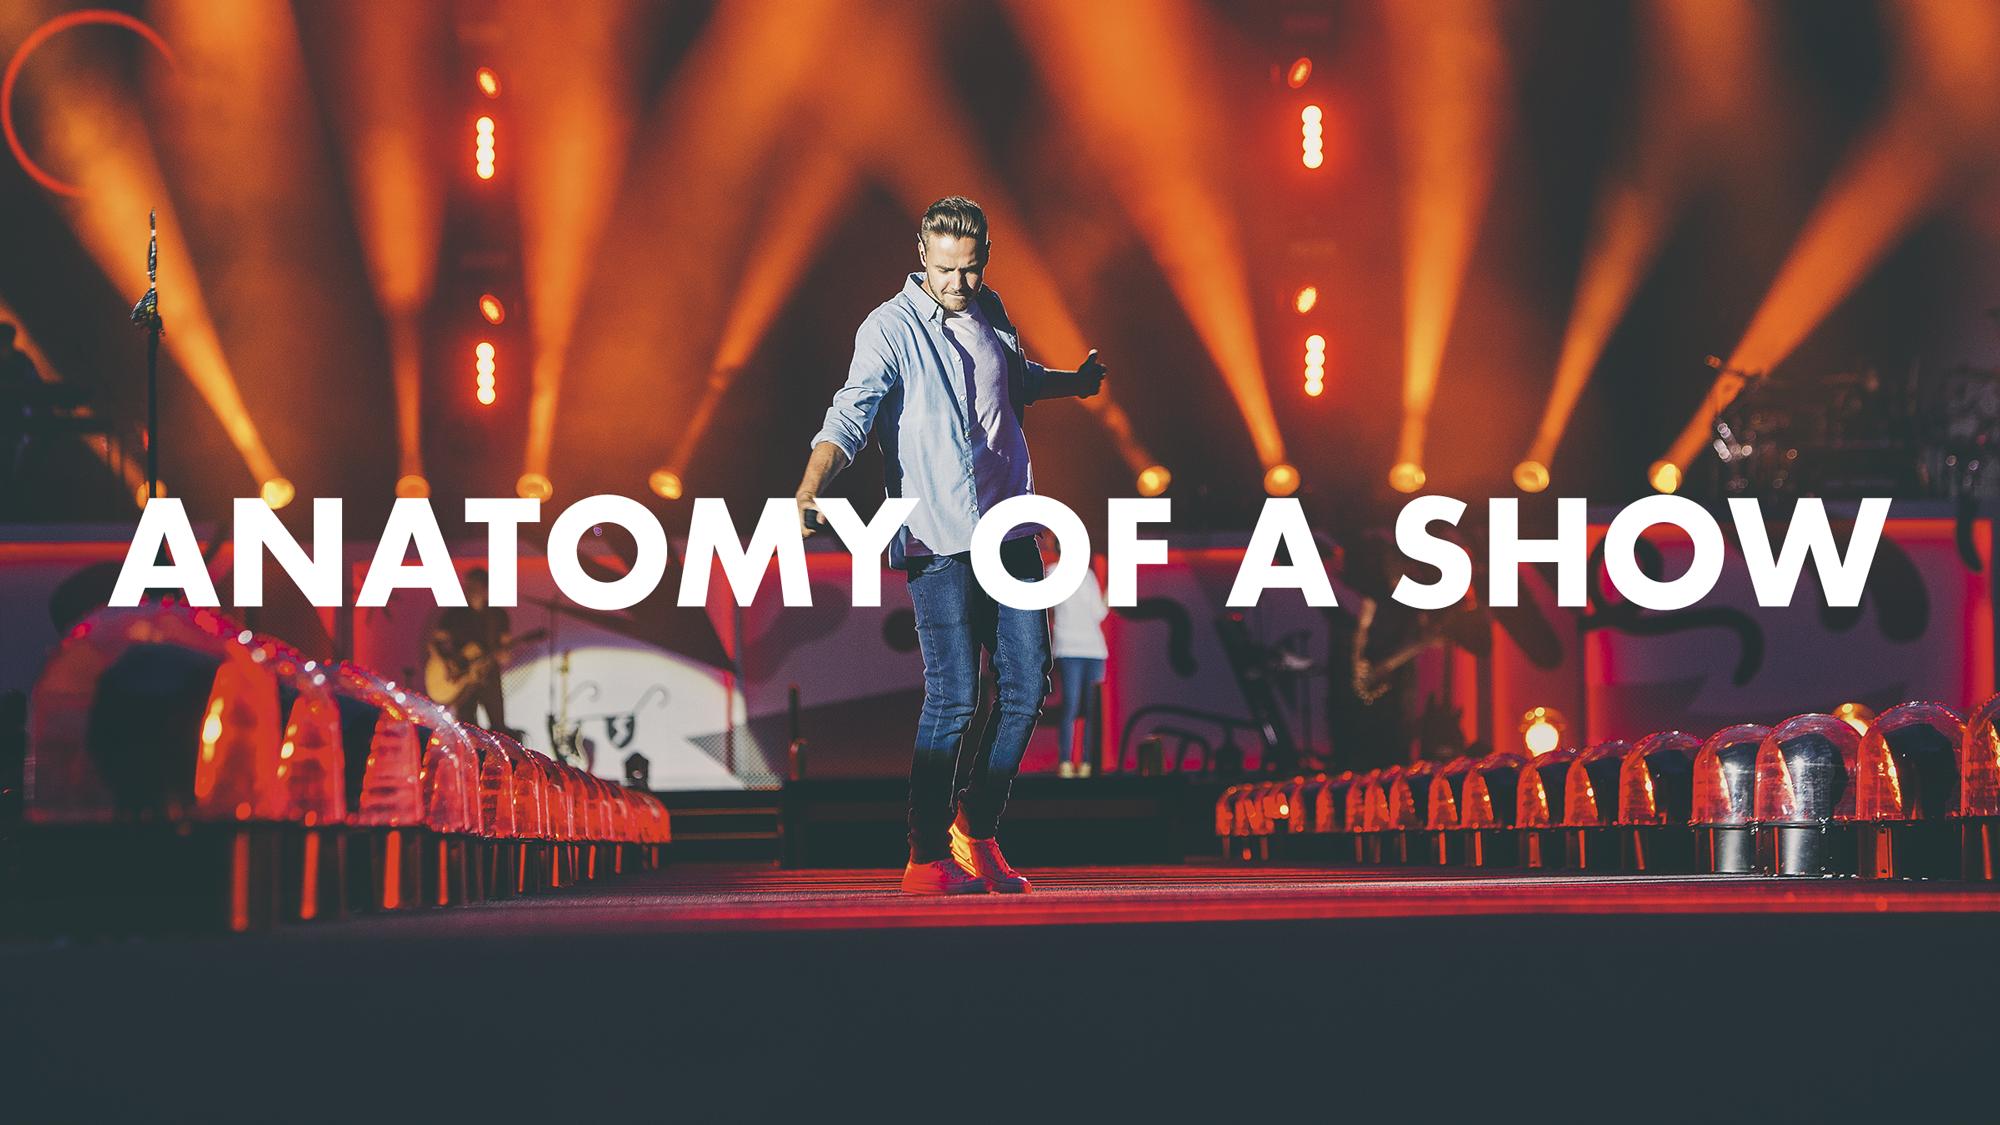 Anatomy of a Show